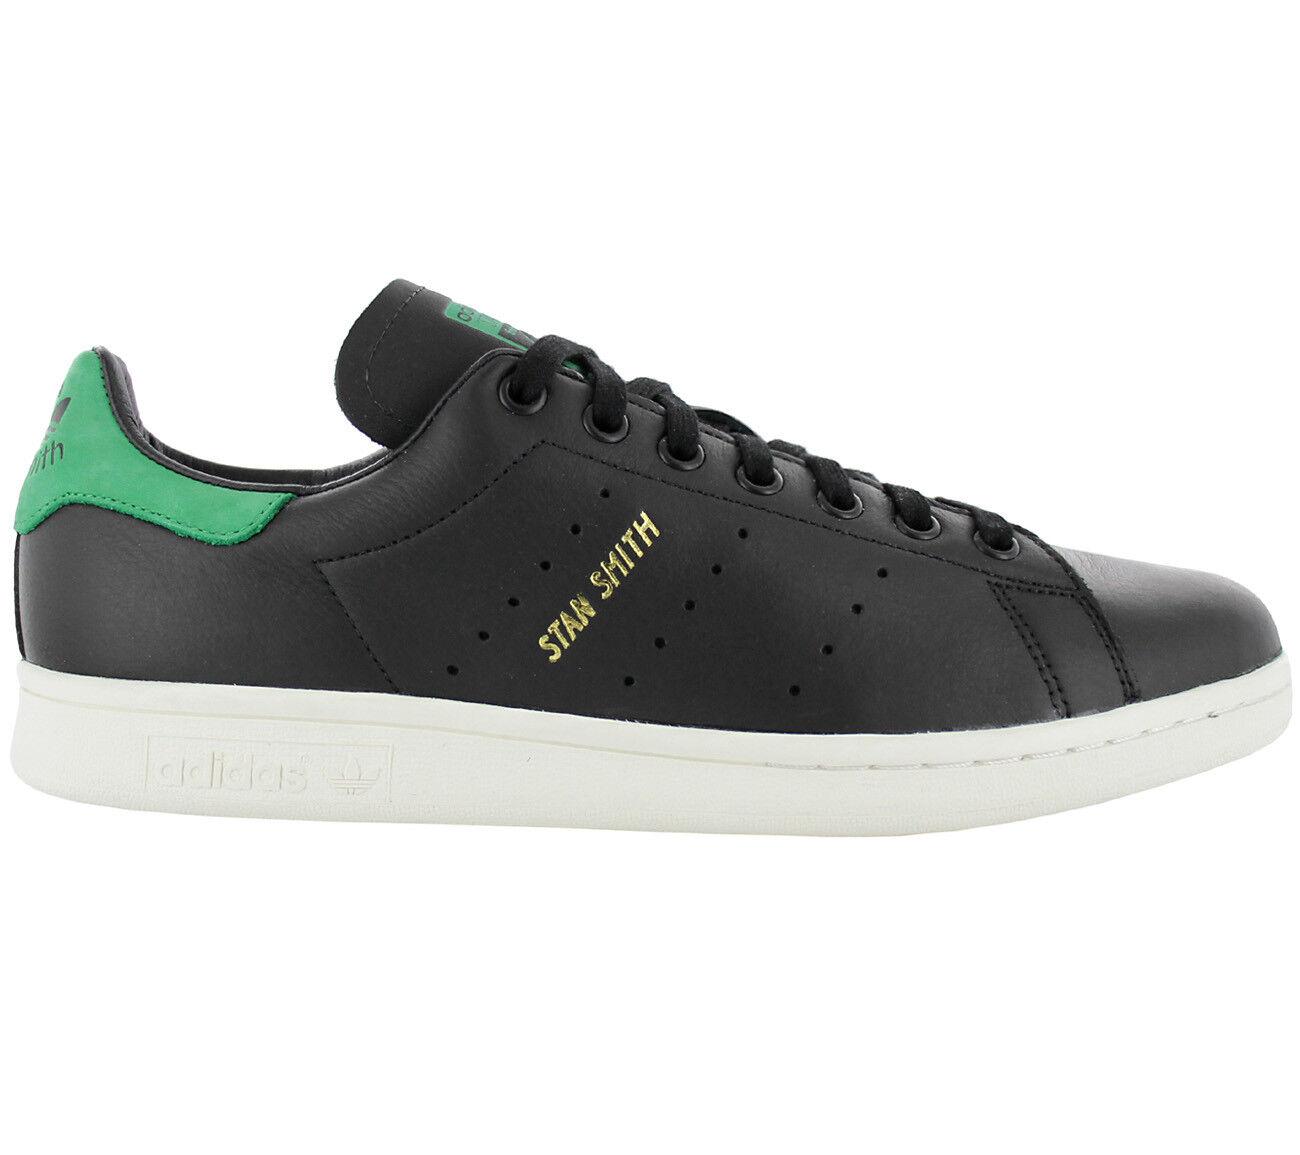 Adidas Originals Stan Smith Damenschuhe aus Leder Schwarzer Sneaker BZ0458 Sneakers